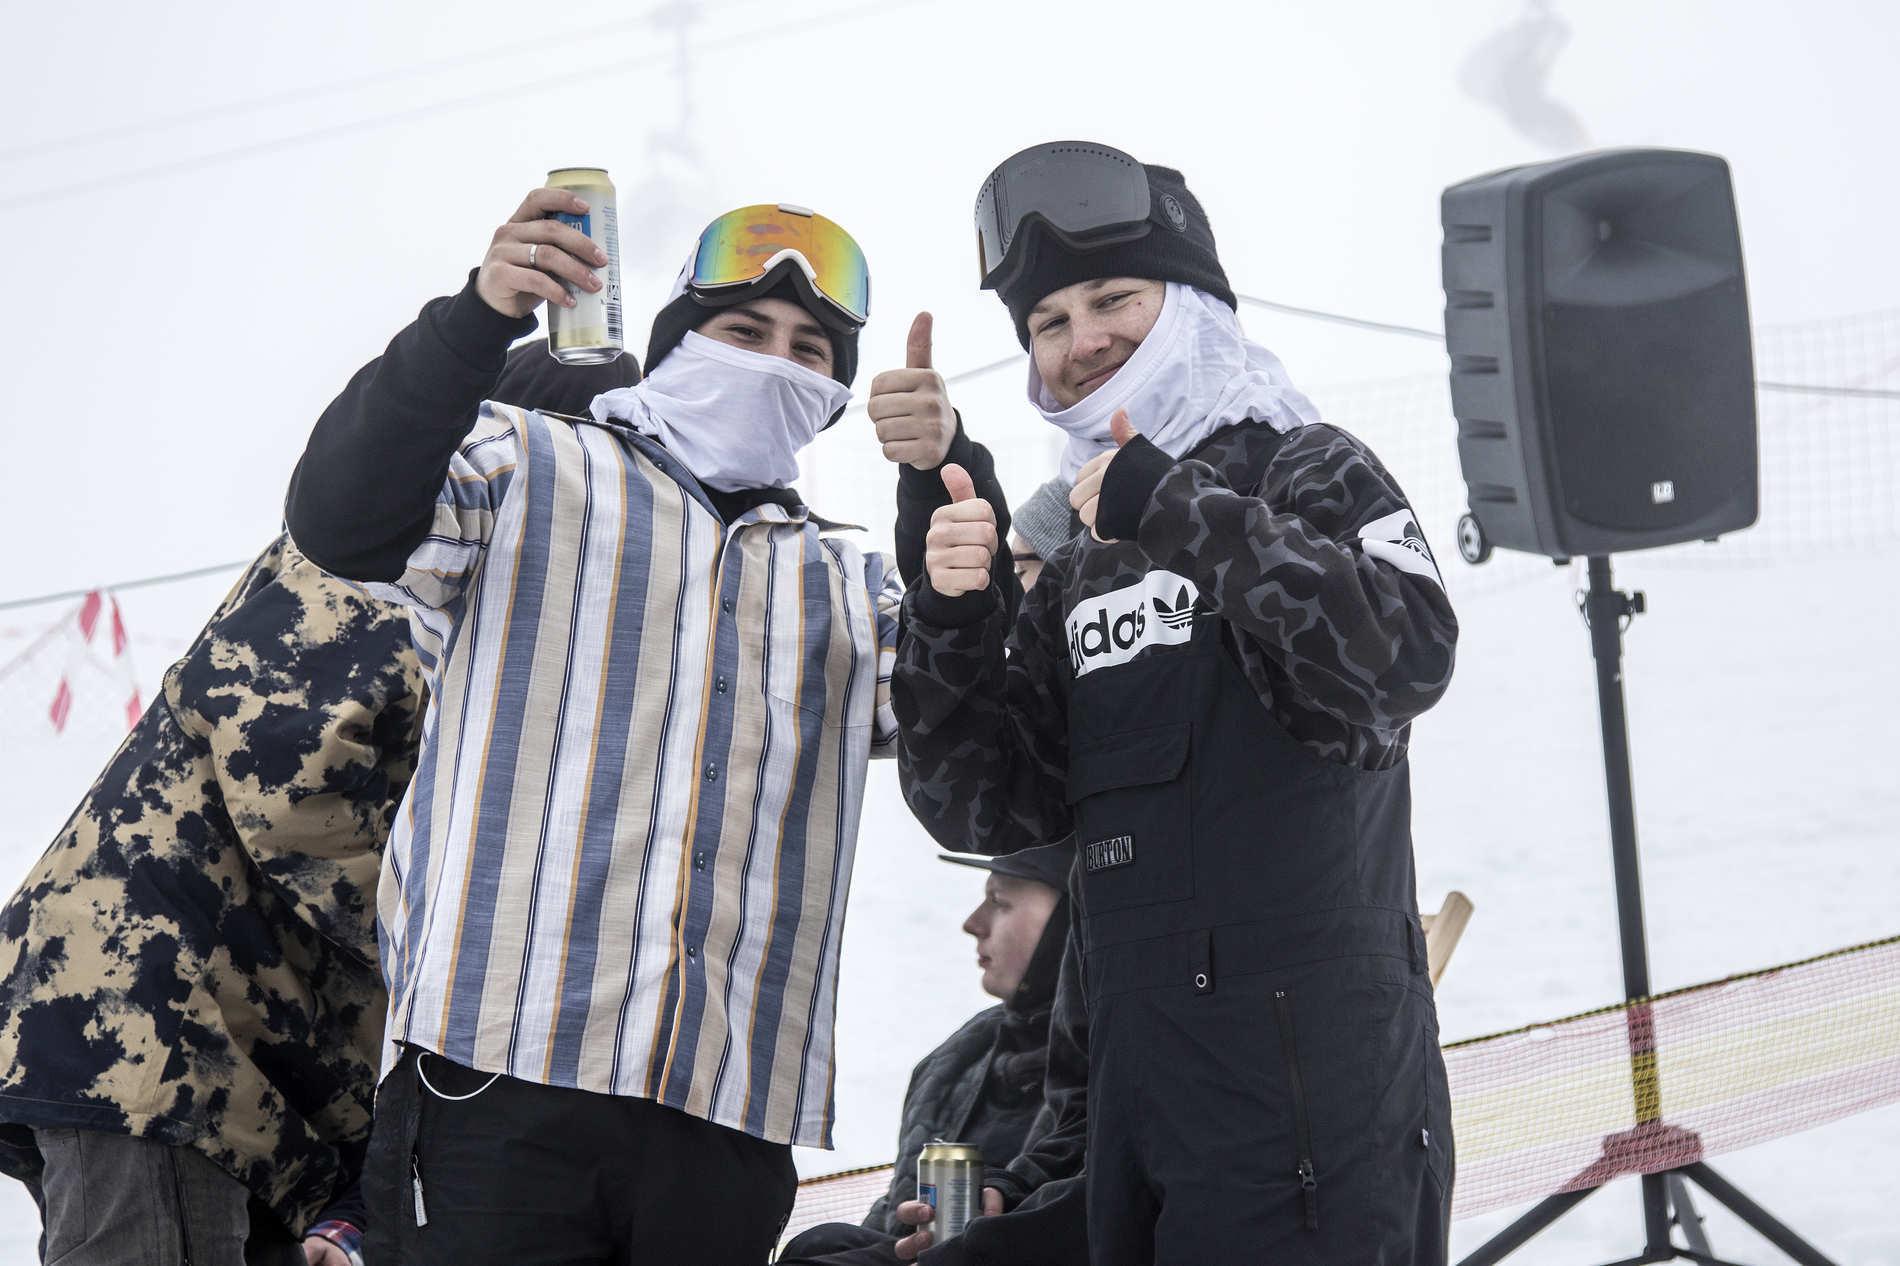 web snowpark feldberg 17 03 2018 lifestyle fs sb martin herrmann qparks 41